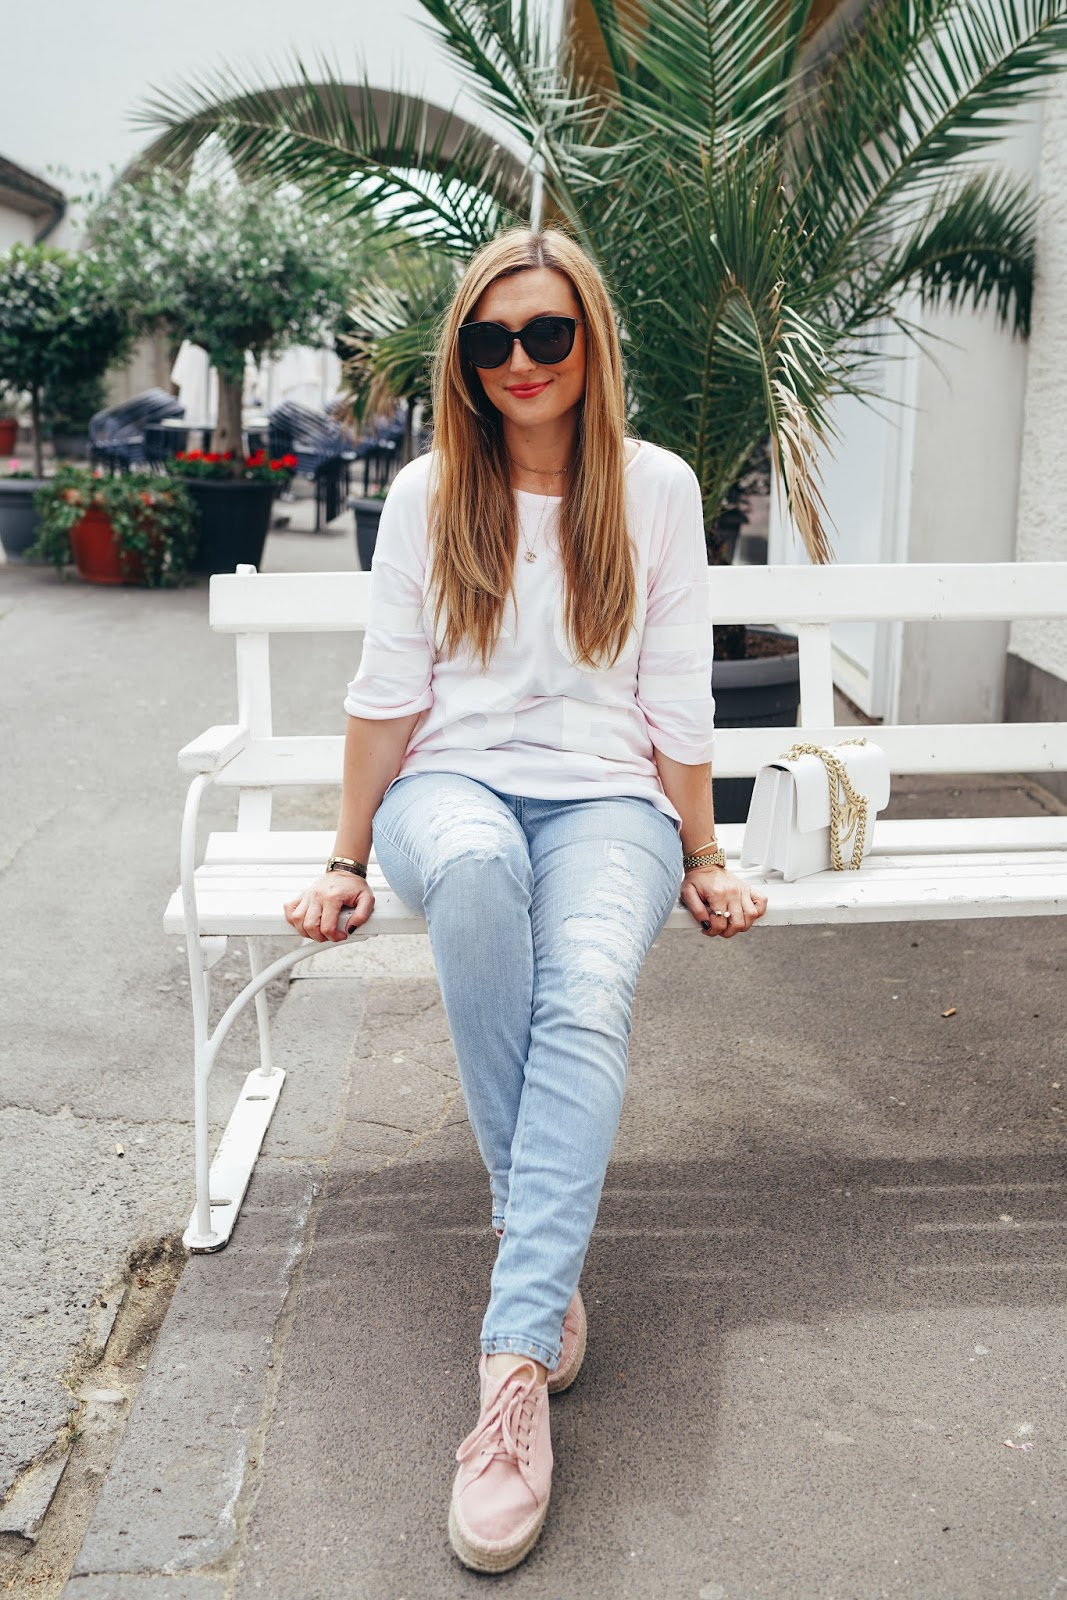 Chanel-Kette-Marc-Aurel-Helle-Jeans-mit-sneaker-wedges-kombinieren-fashionstylebyjohanna